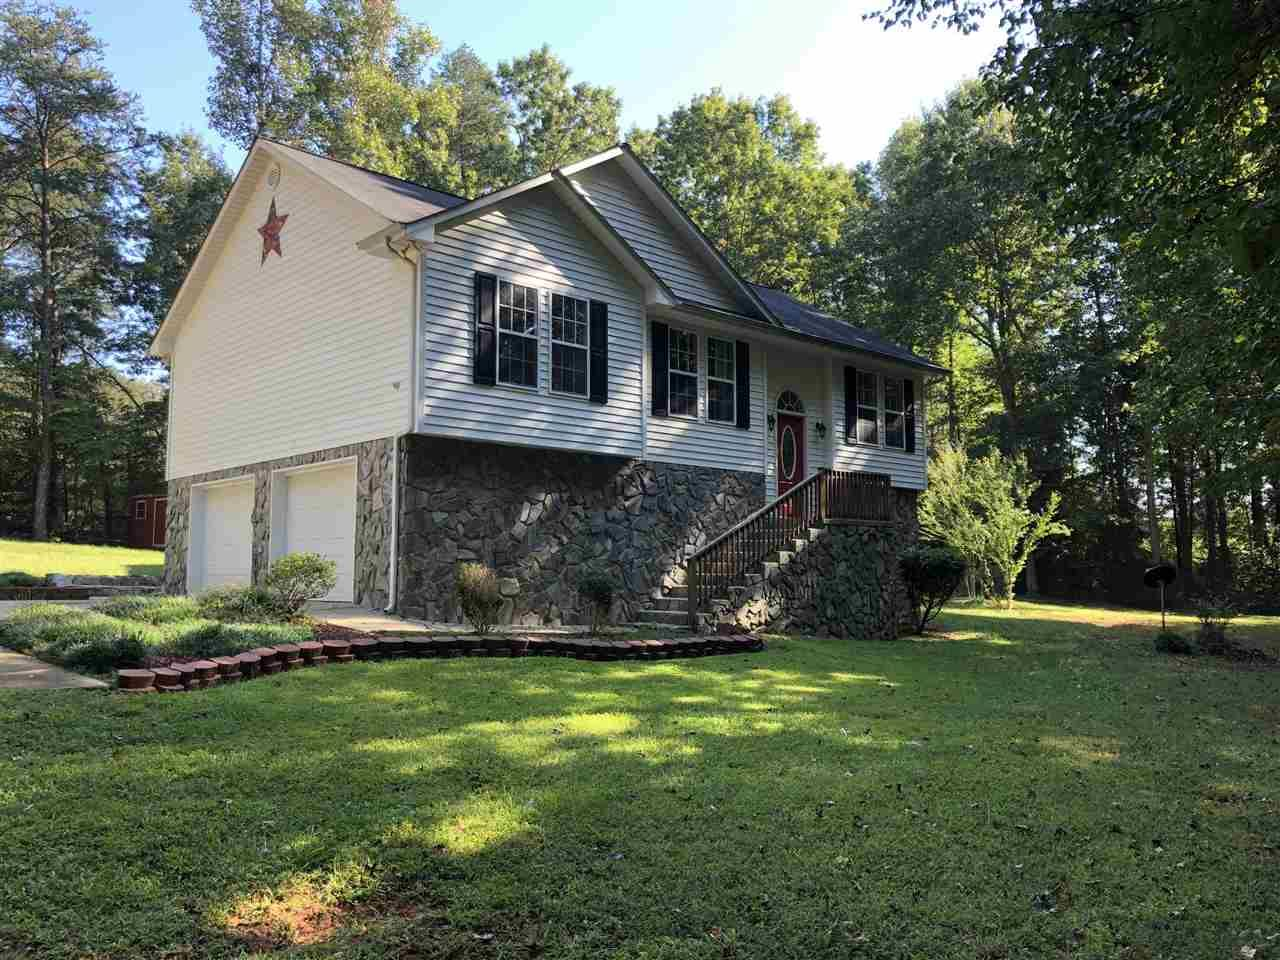 778 Robinson Creek Rd, Bostic, NC 28018 - #: 48015